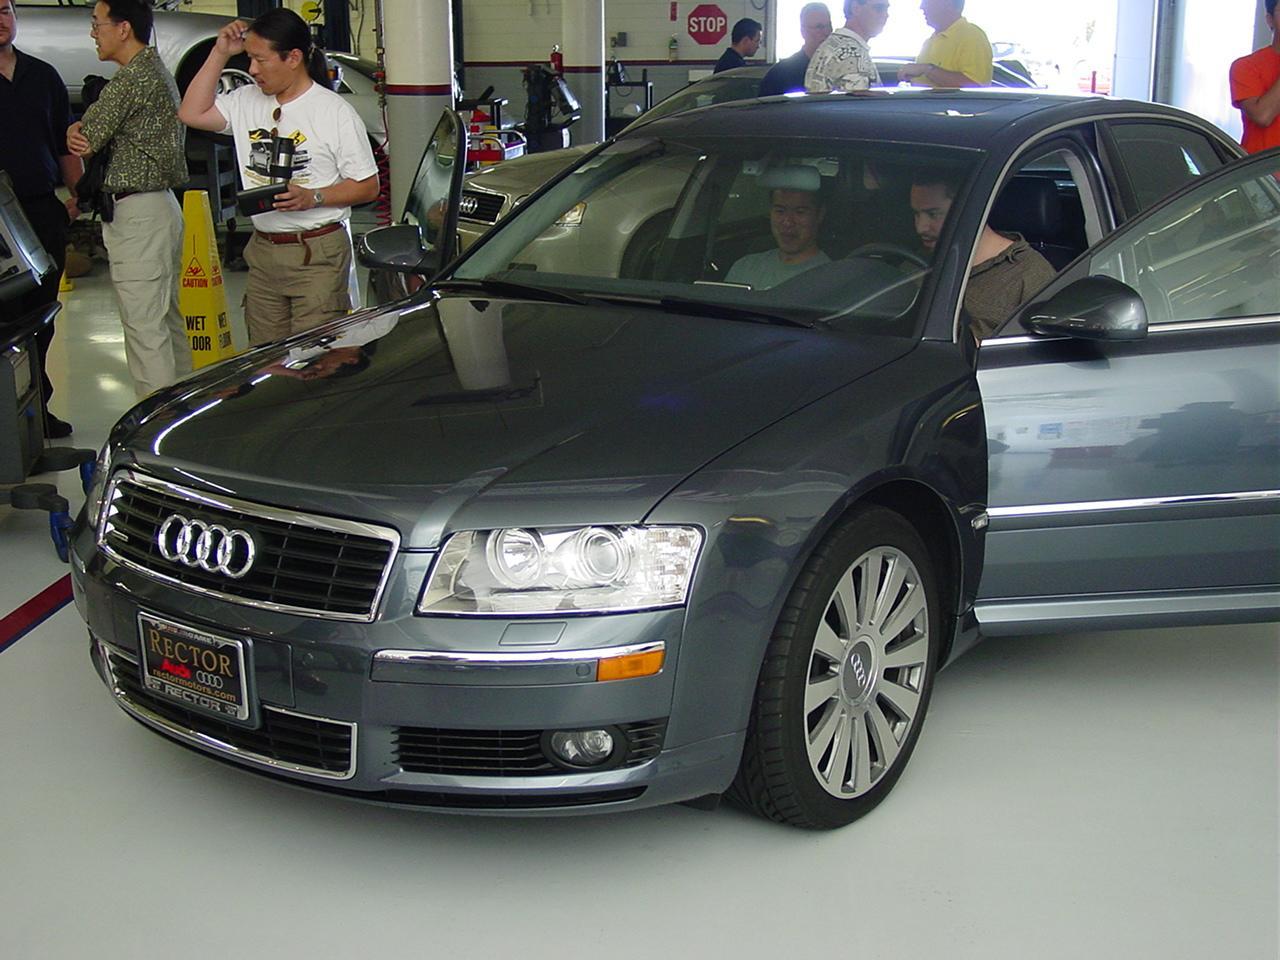 Audi Club Dealer Day At Rector Audi Burlingame CA - Rector audi